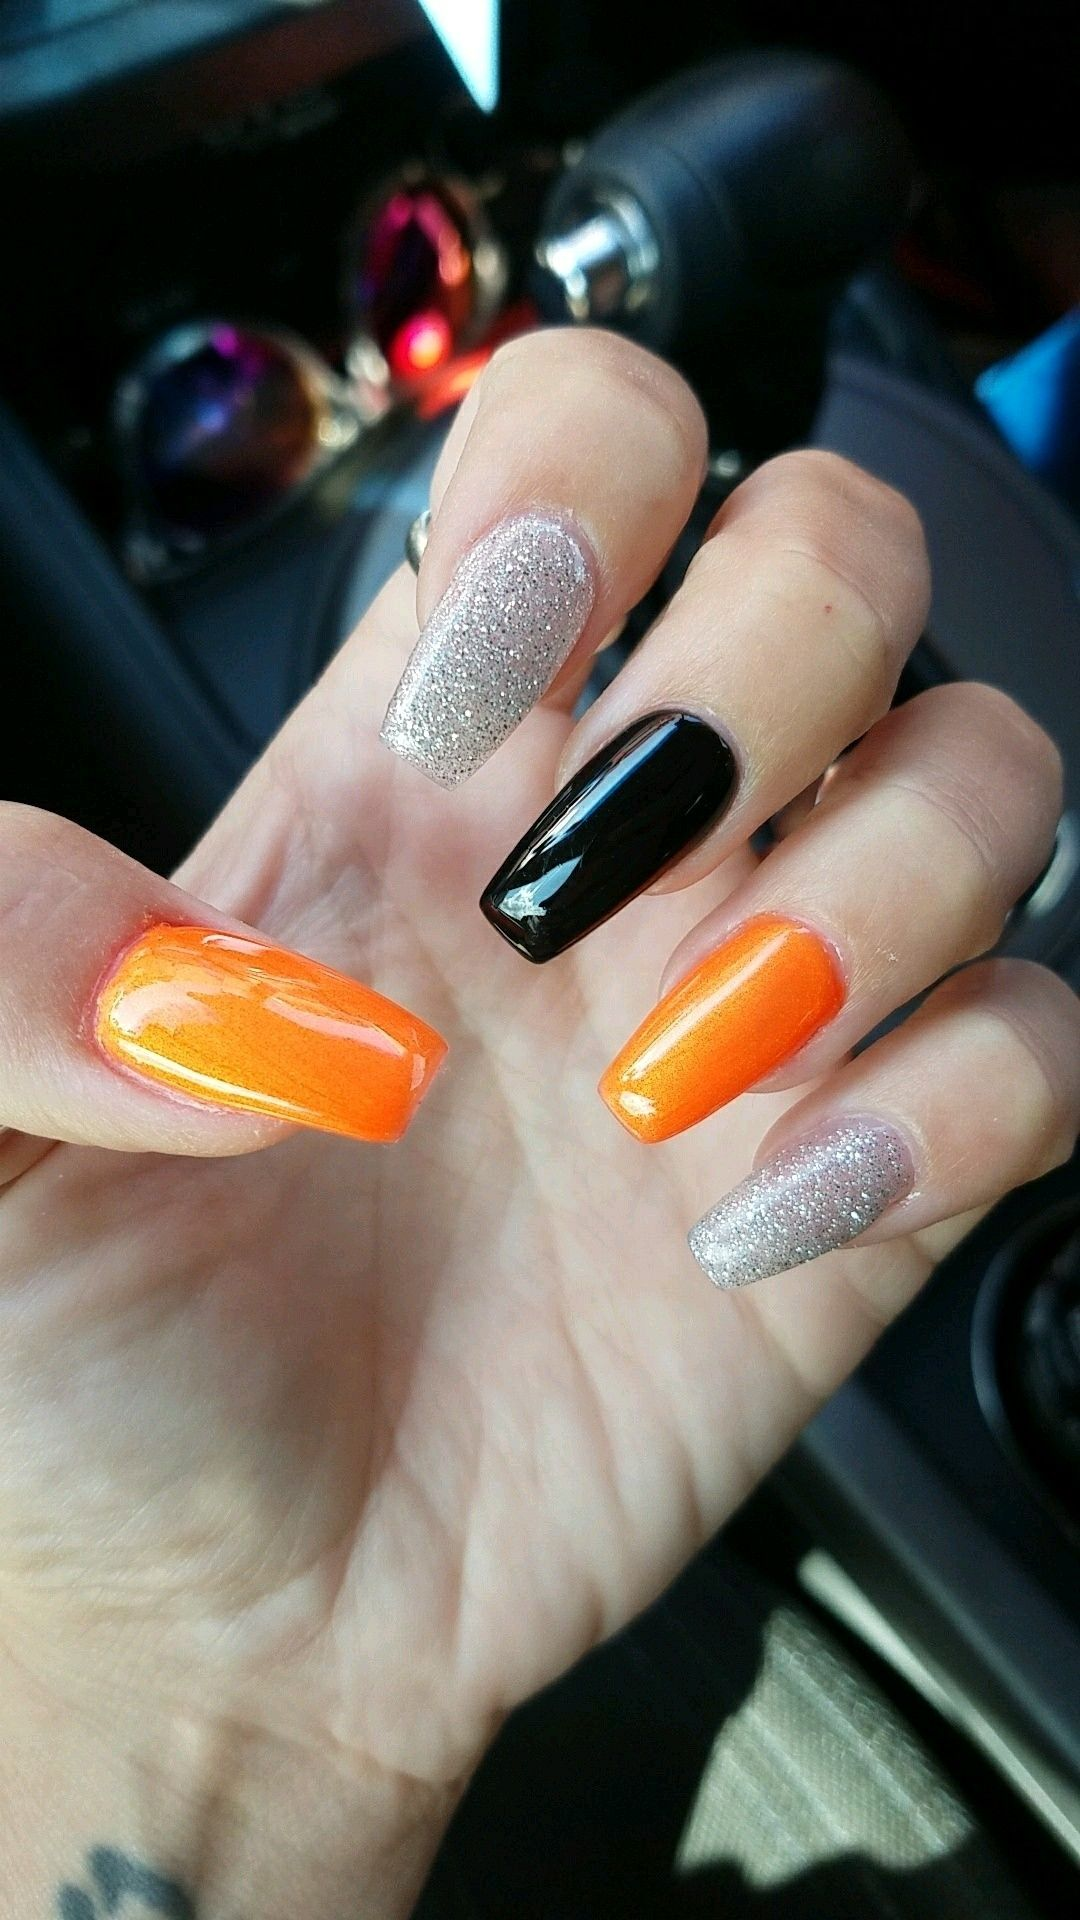 Orange And Black Nail Designs : orange, black, designs, Halloween, Nails, Design, #coffinnails, #halloween, #longnails, #orange, Black, #silver, Nails,, Acrylic